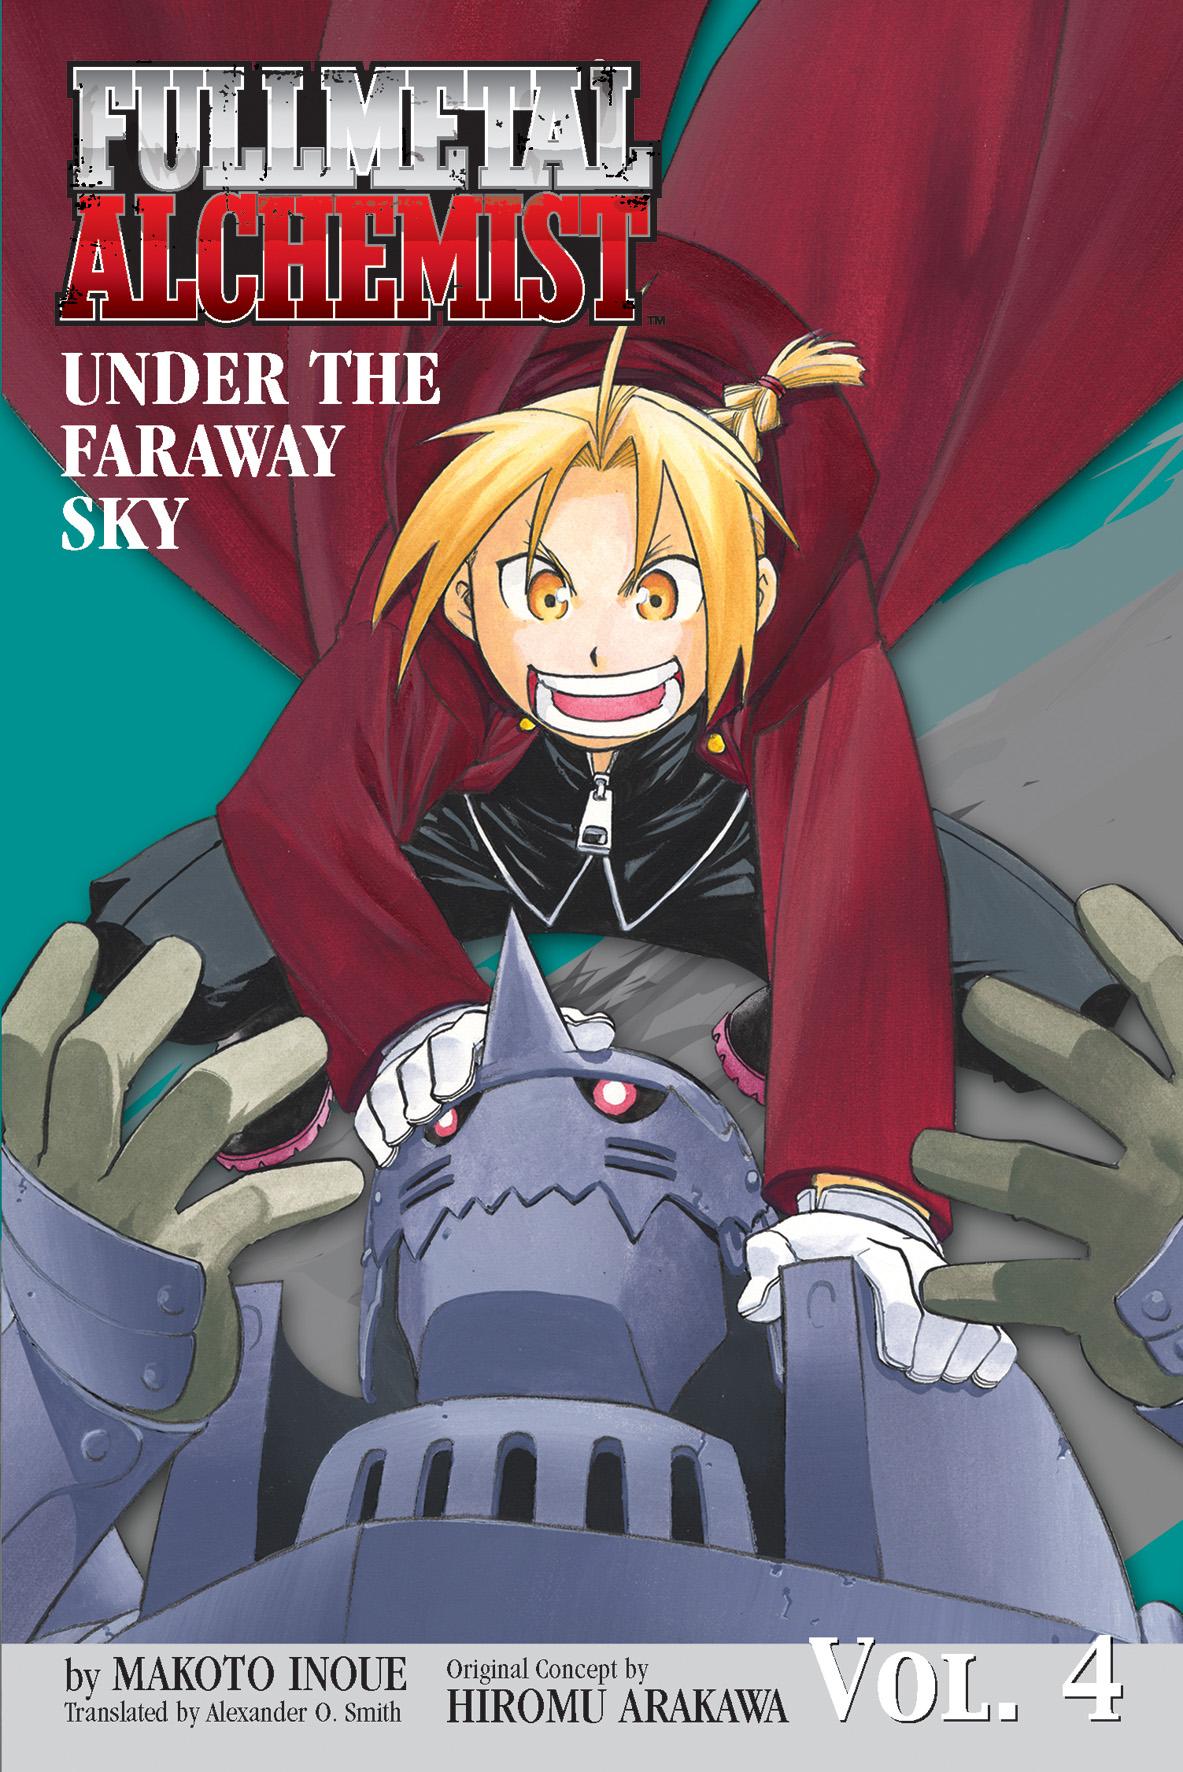 fullmetal alchemist the ties that bind novel book by makoto fullmetal alchemist under the faraway sky novel